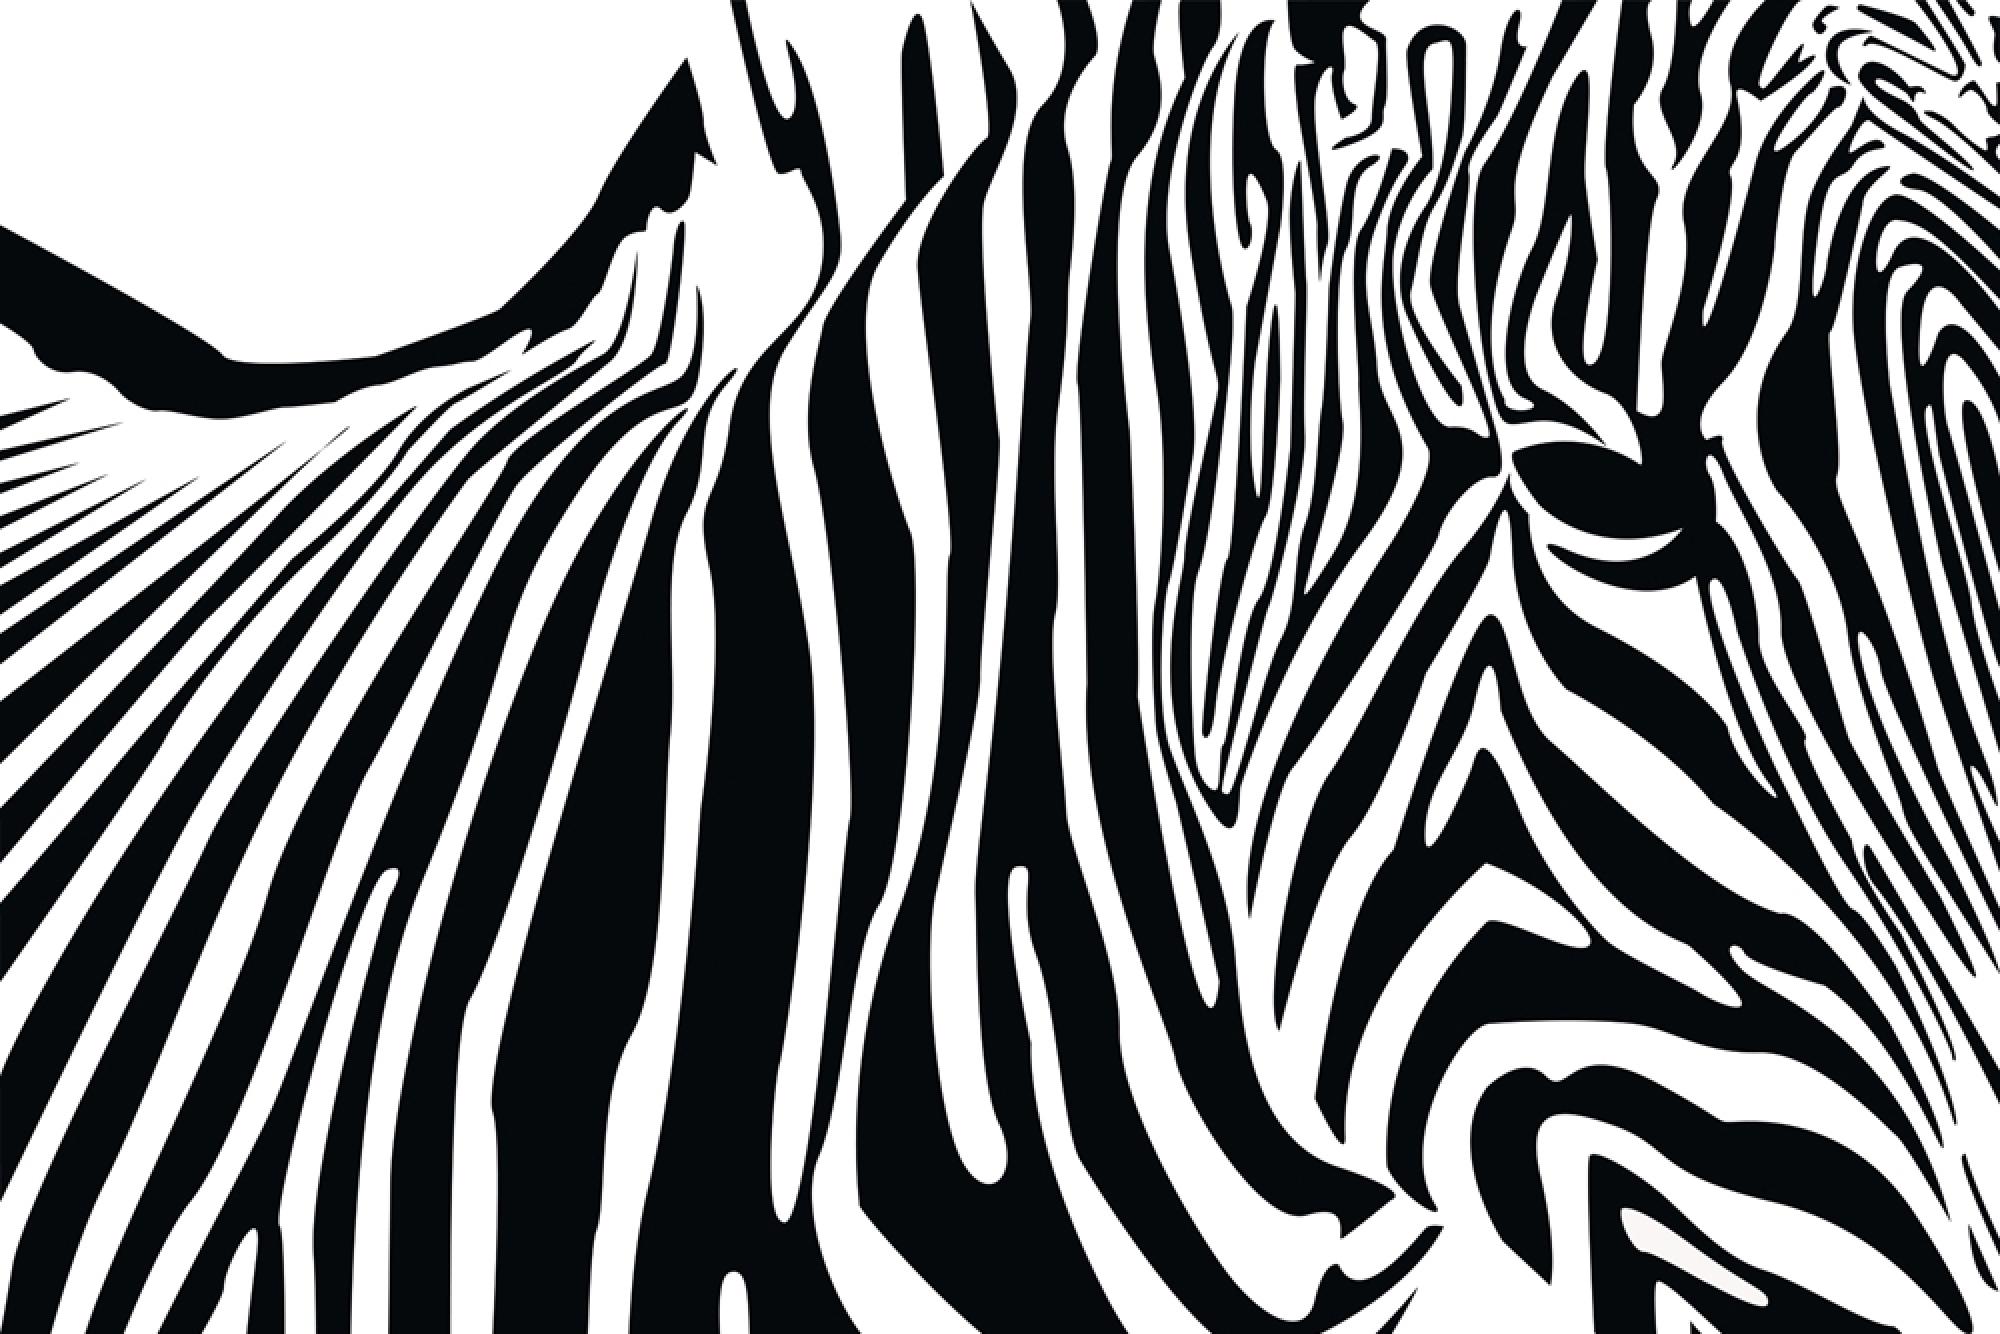 Zebra patterned wallpaper - Zebra Patterned Wallpaper 42